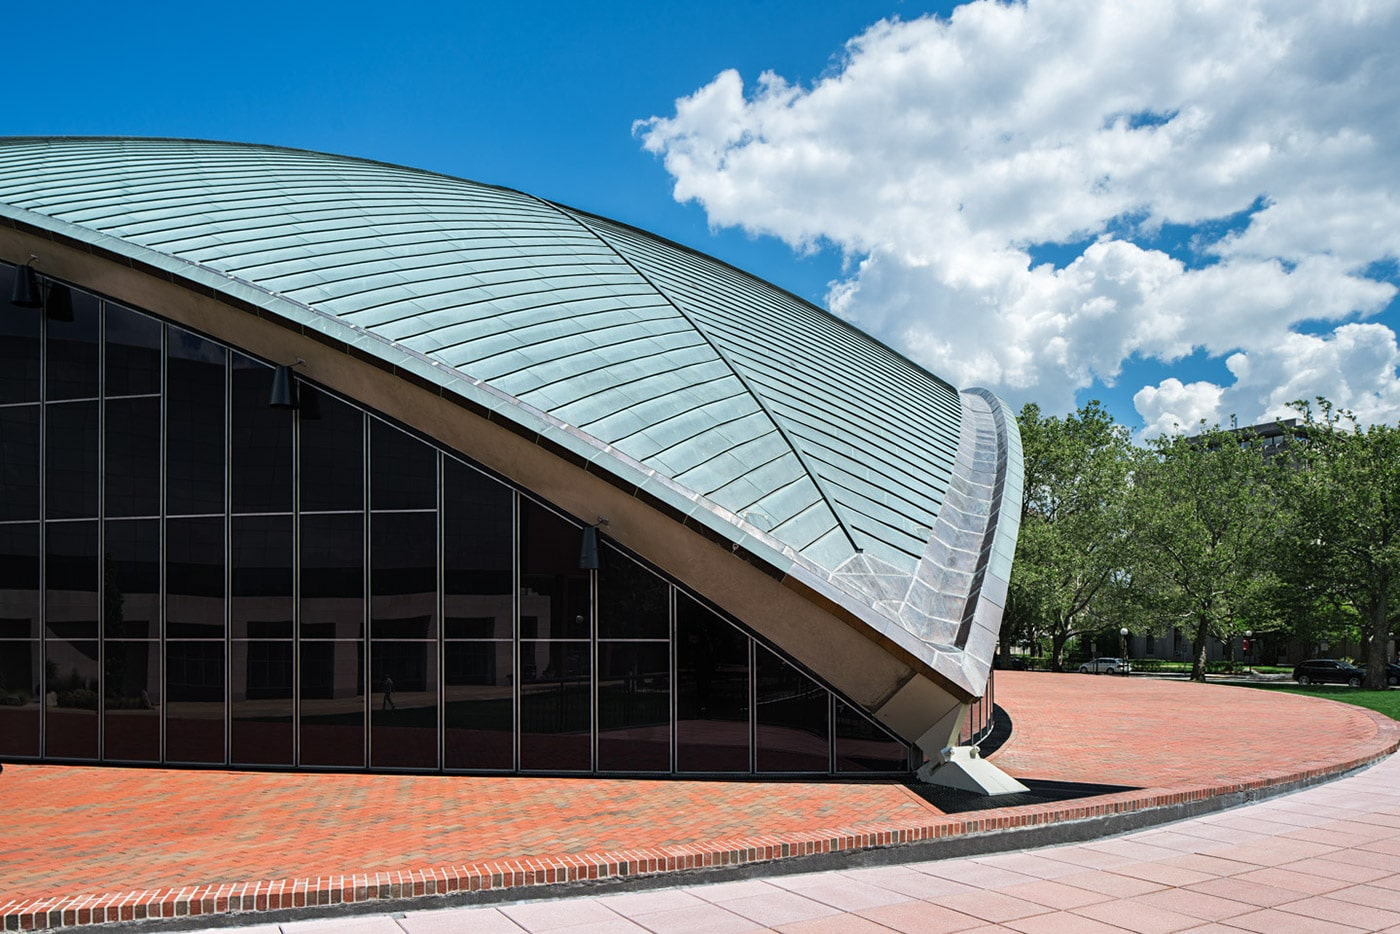 ارو سارینن Kresge Auditorium, MIT